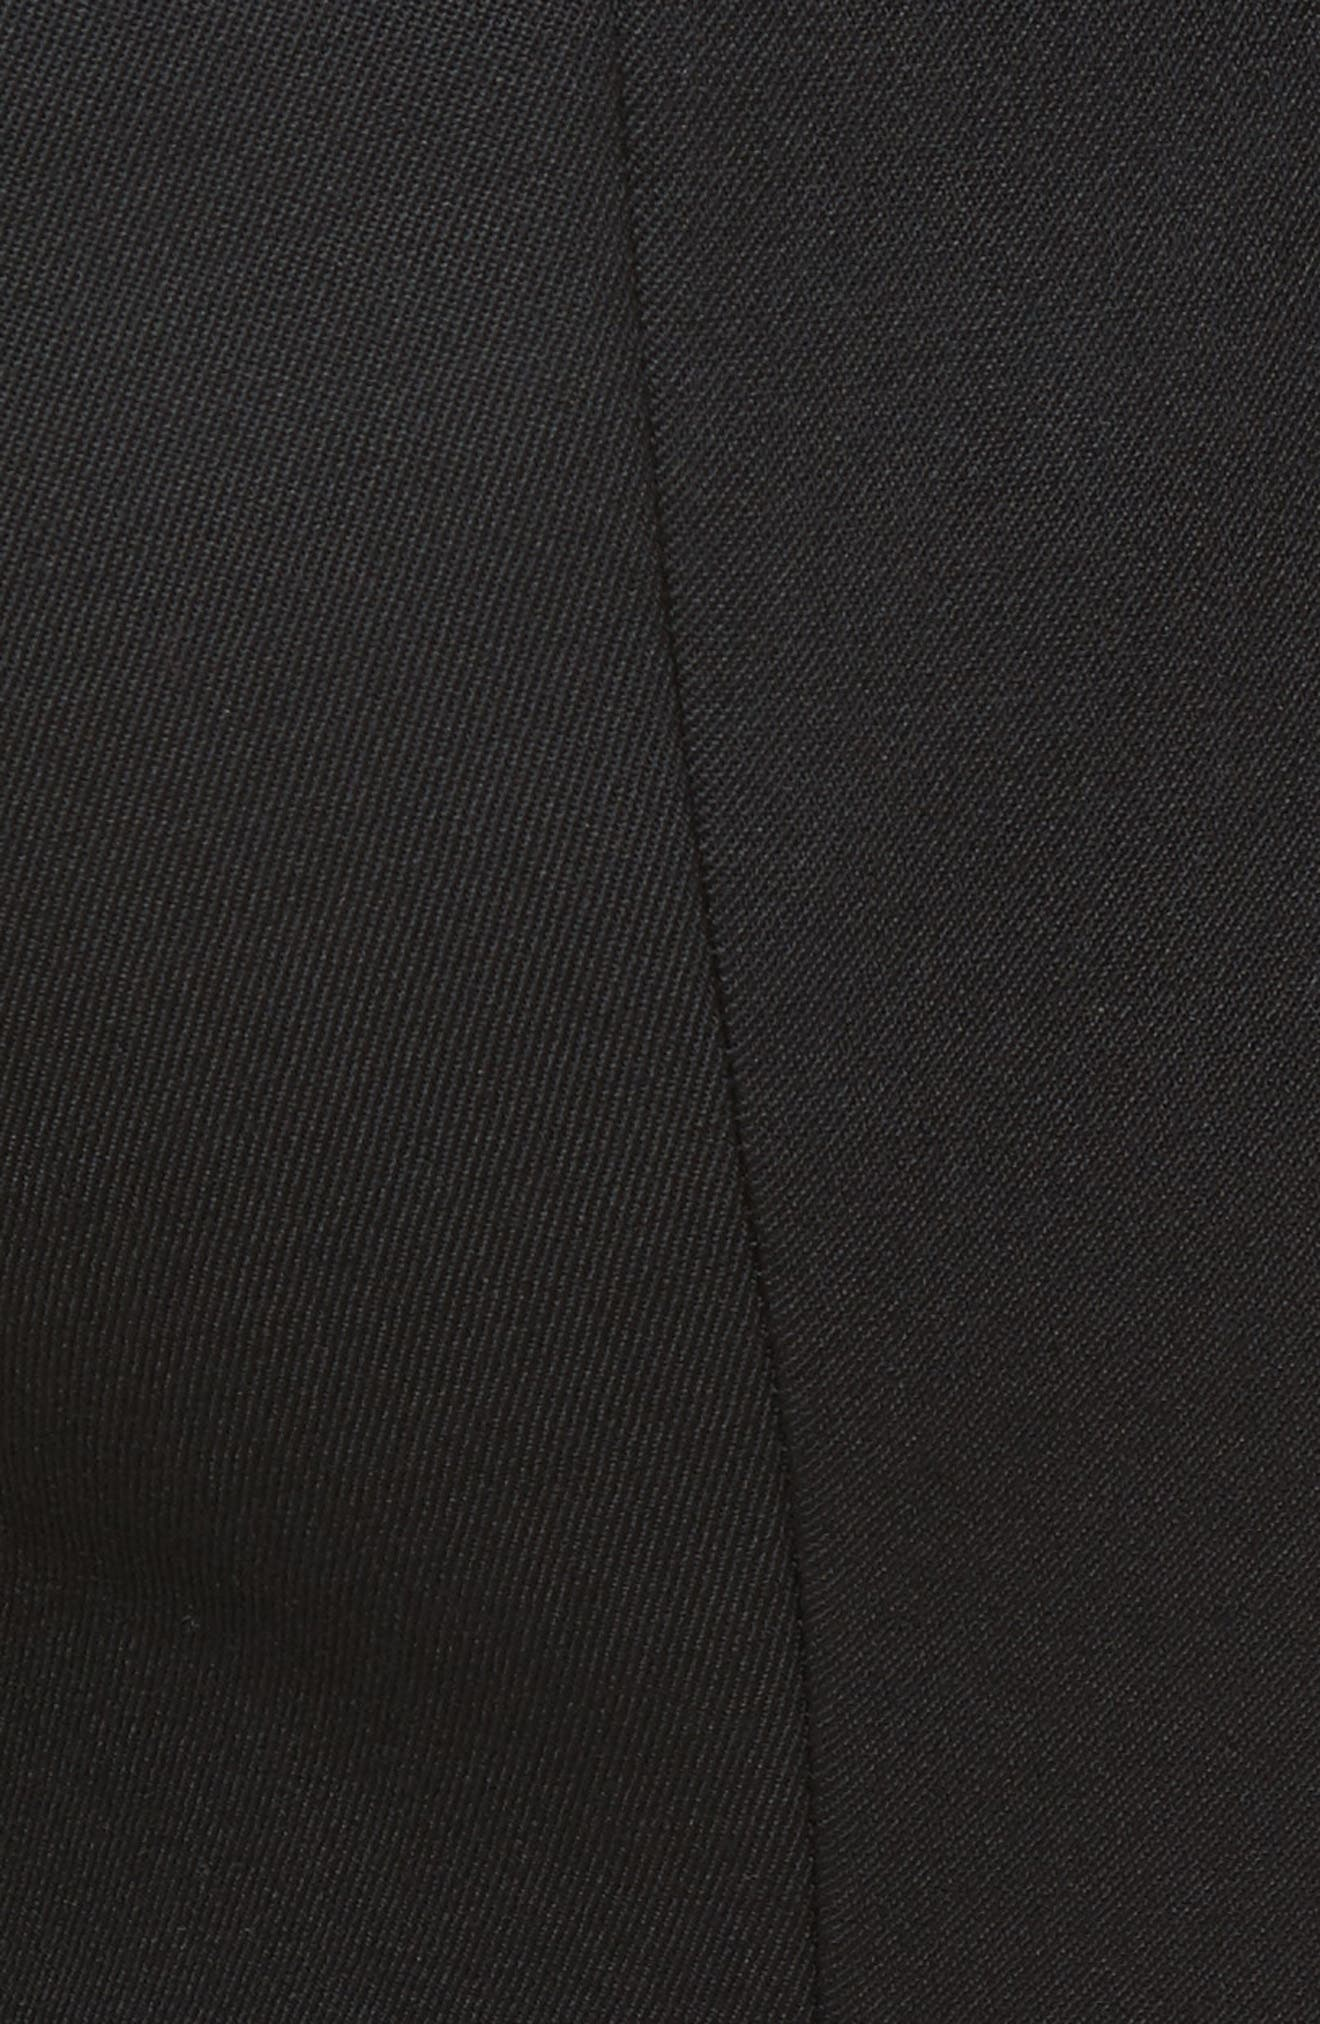 Satin Trim Stretch Wool Gabardine Pants,                             Alternate thumbnail 5, color,                             001